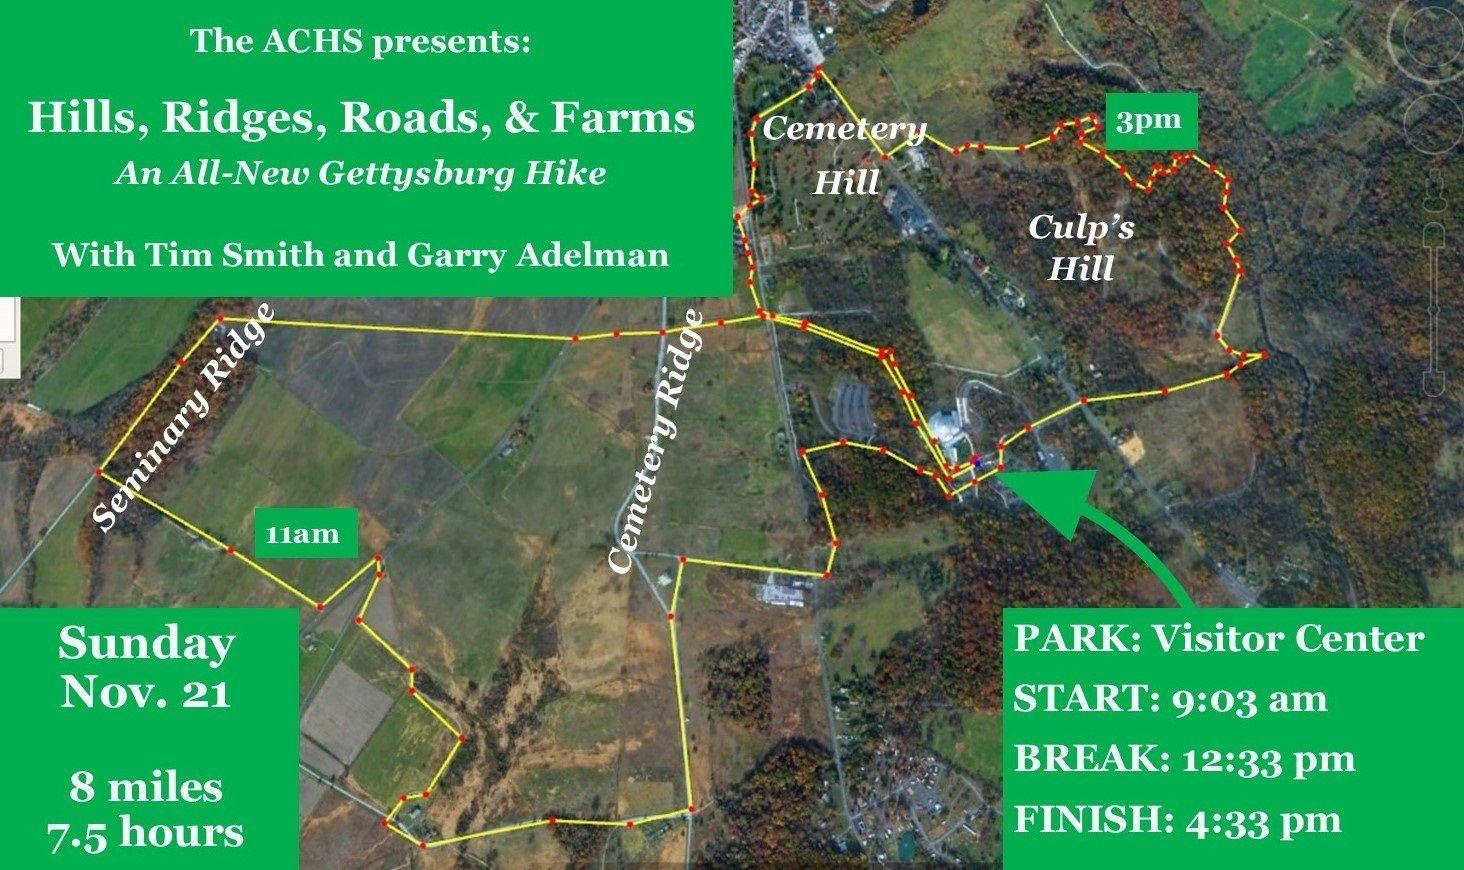 Gettysburg Hike, ACHS